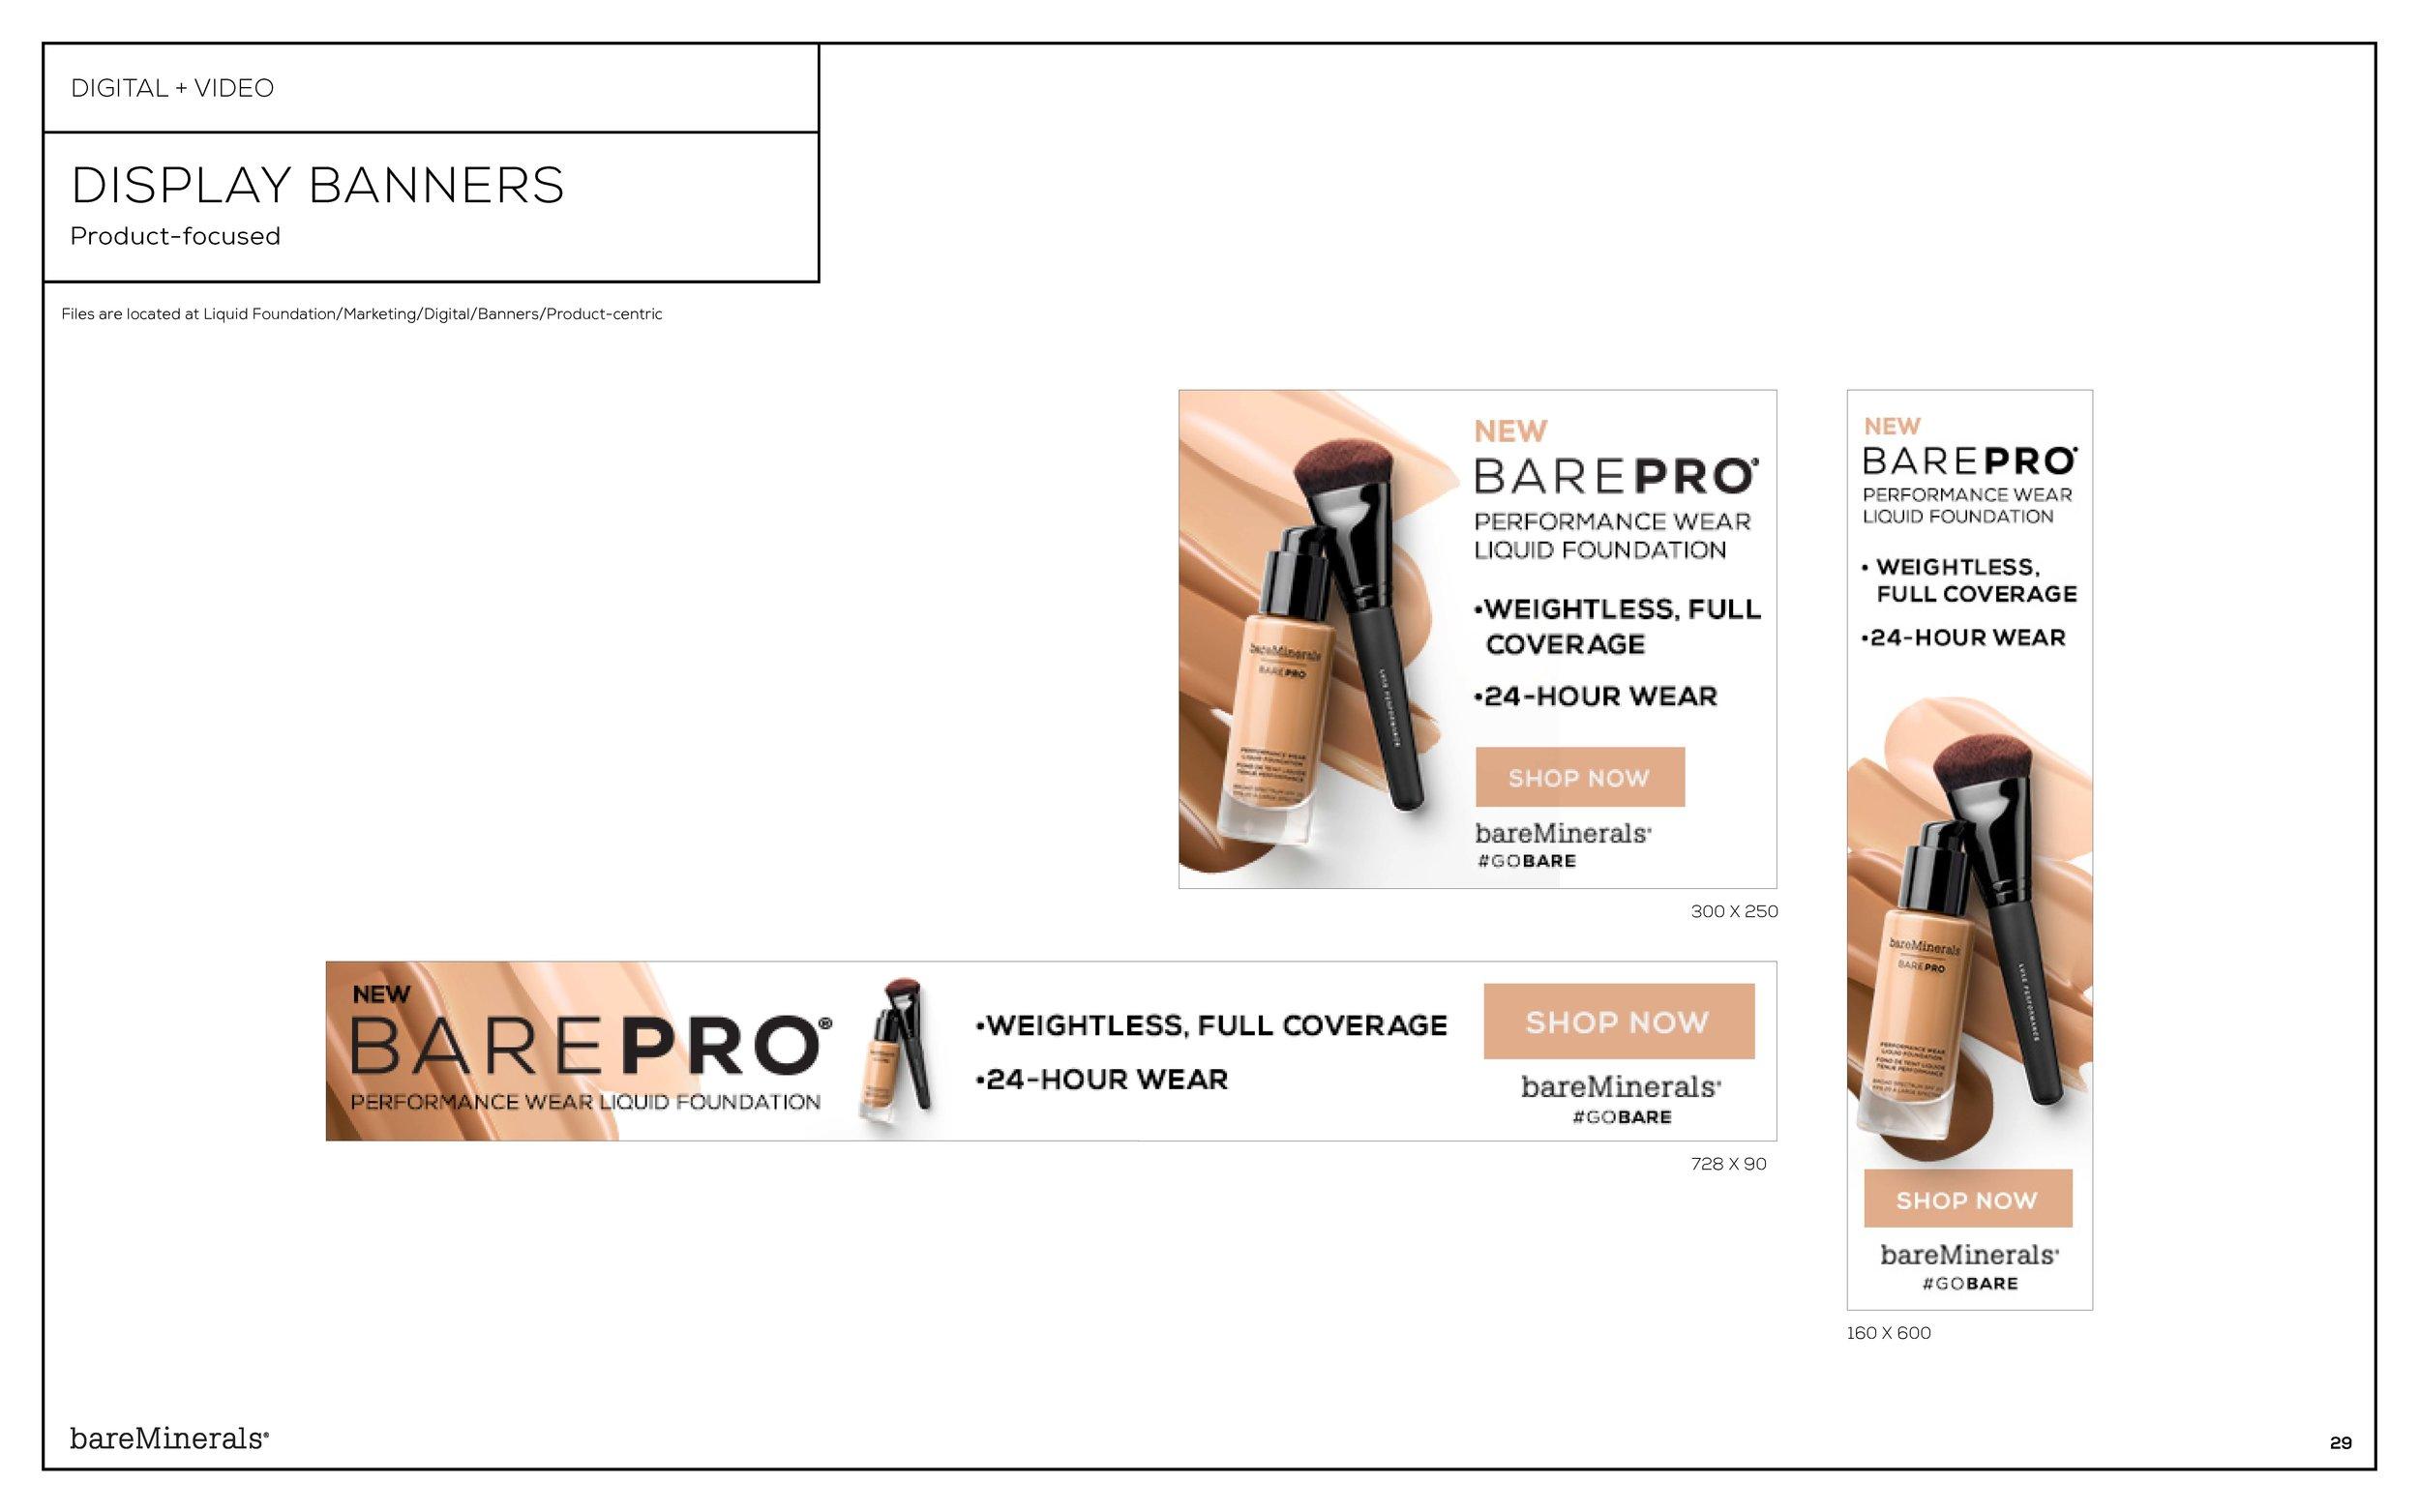 barePro_Liquid Foundation_Toolkit_Page_29.jpg